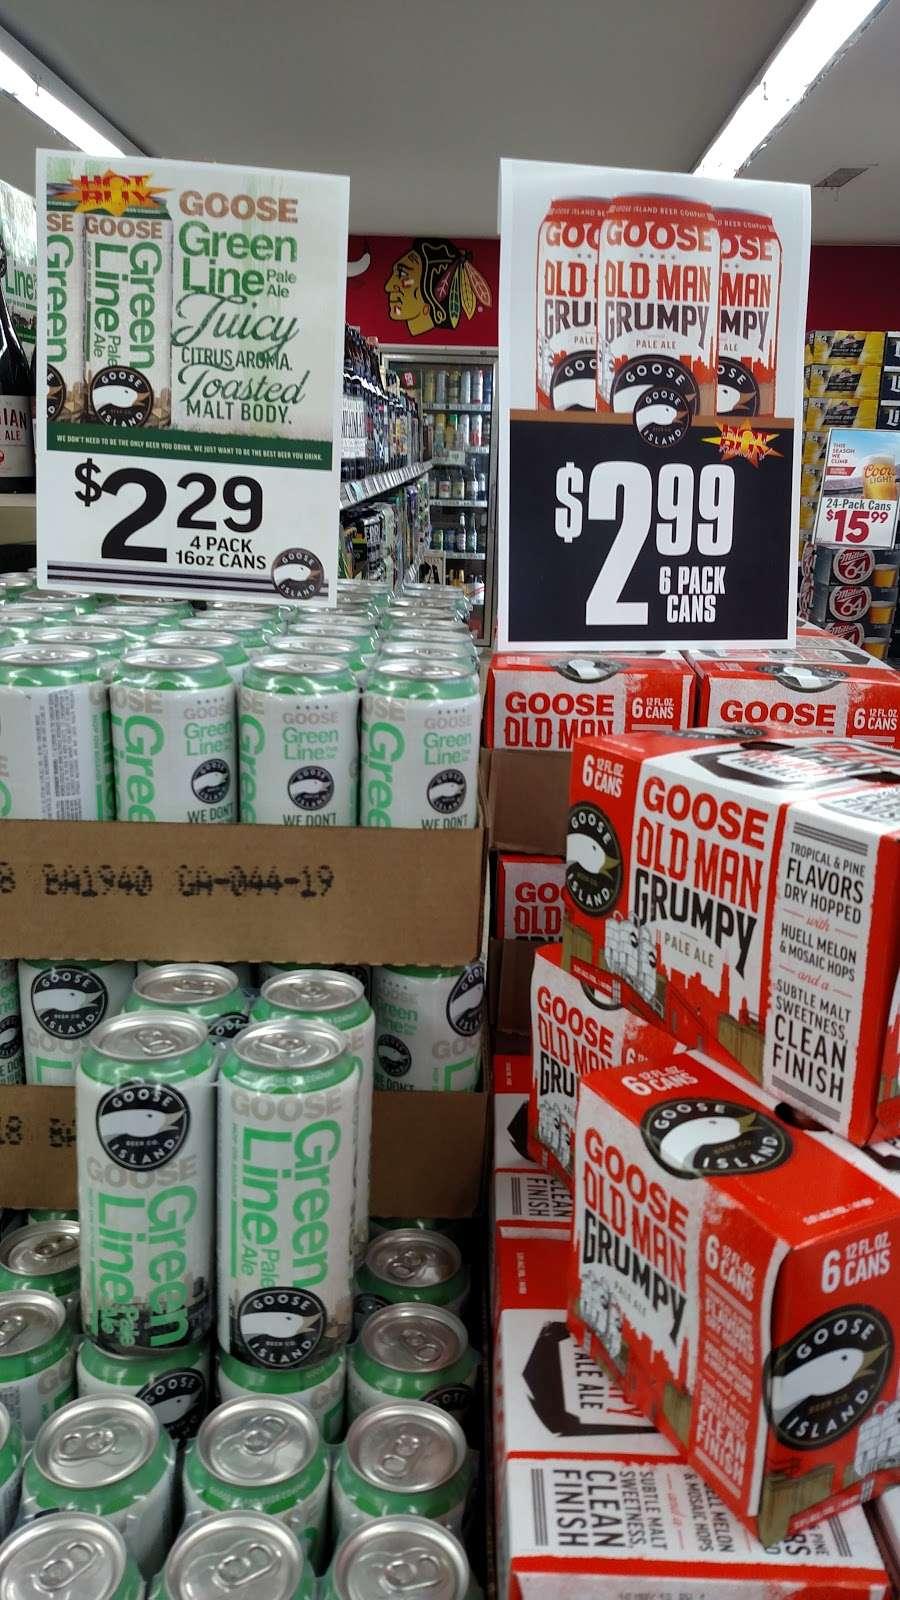 Consumers Liquor Stores Inc - store  | Photo 6 of 10 | Address: 1134 Plainfield Rd, Joliet, IL 60435, USA | Phone: (815) 723-7331